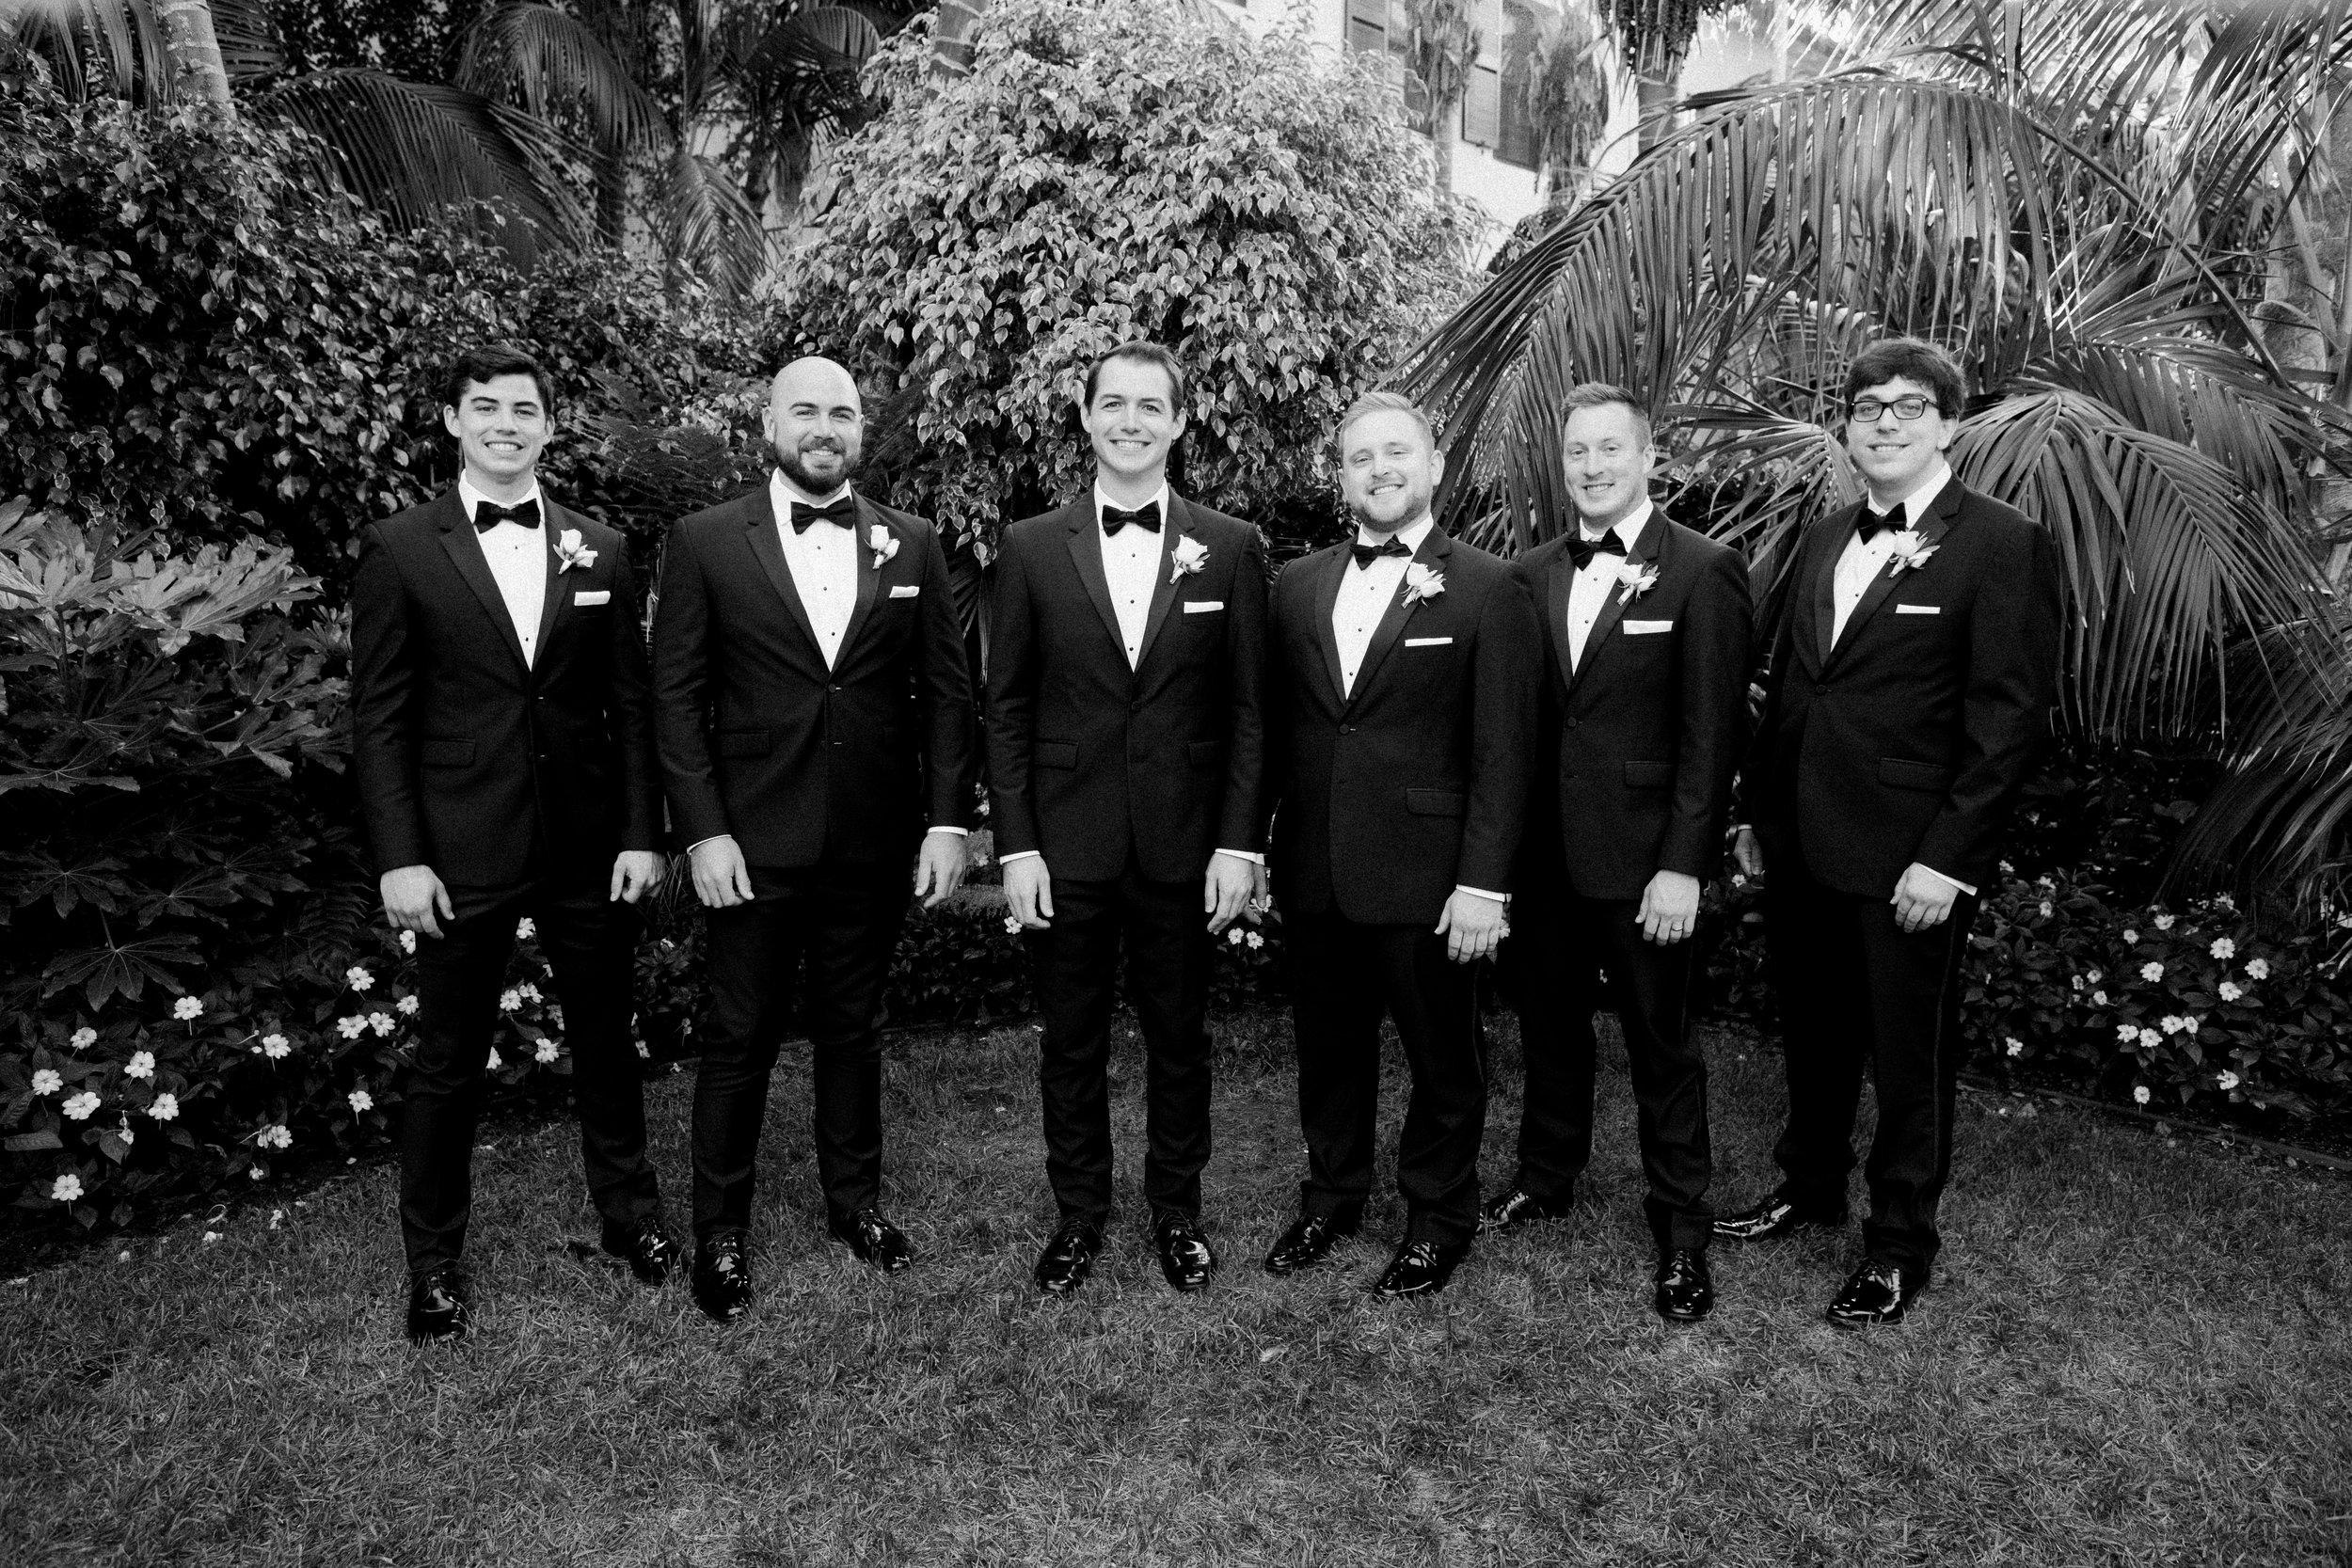 www.santabarbarawedding.com | KB Events | Michael and Anna Costa | Four Seasons The Biltmore | Groomsmen